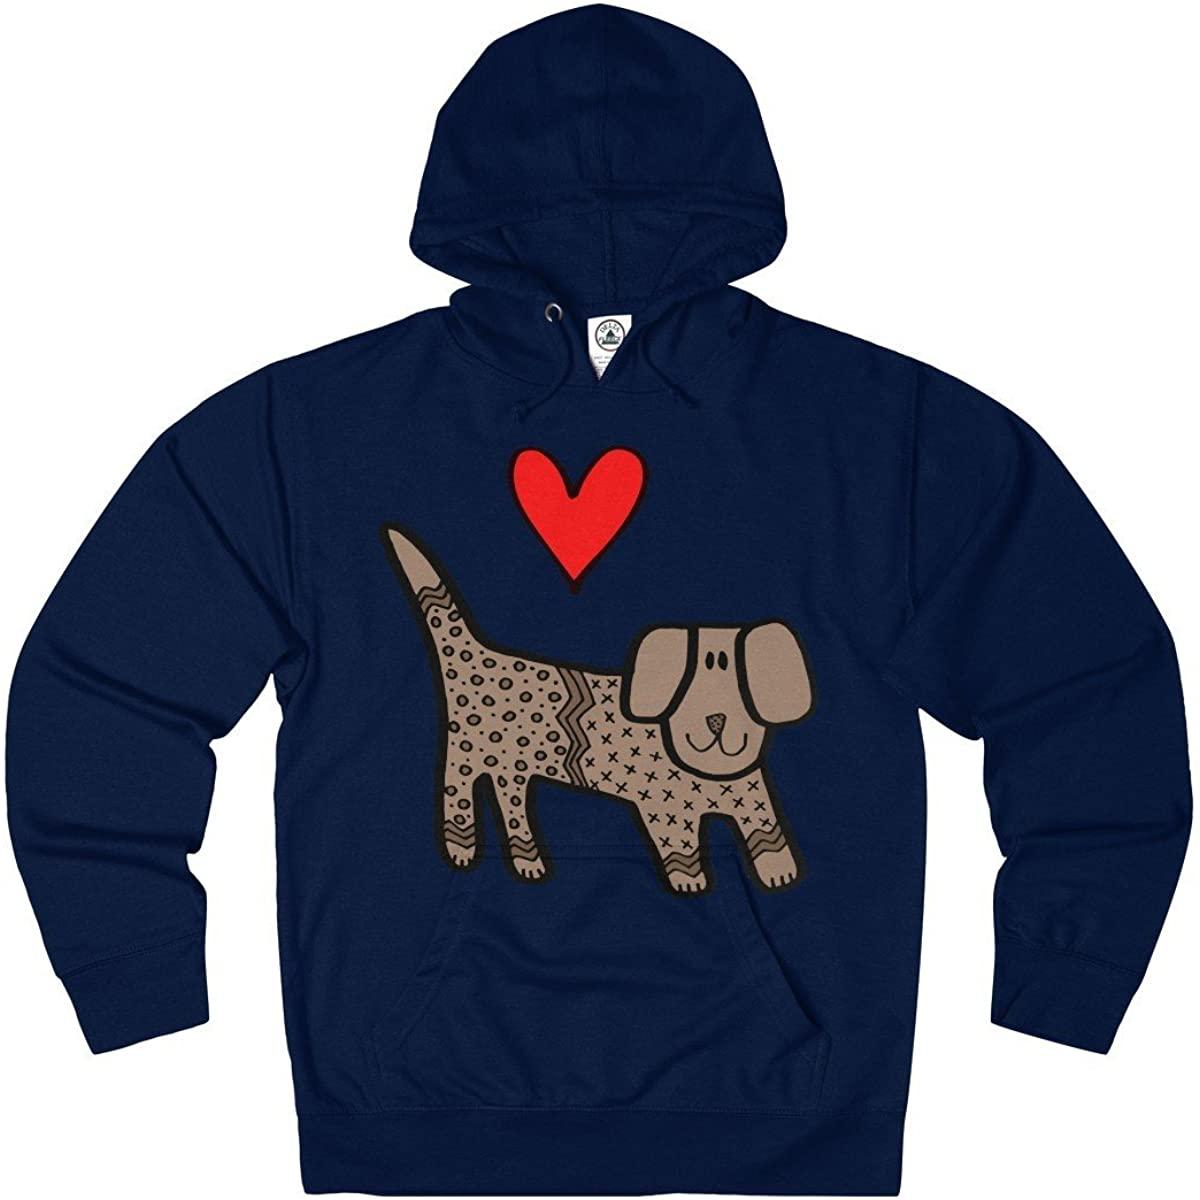 USpin Dog Lover Hoodie Sweatshirt For Women Men Boys Girls - Cute Dog Lover Gift Idea - French Terry Hoodie